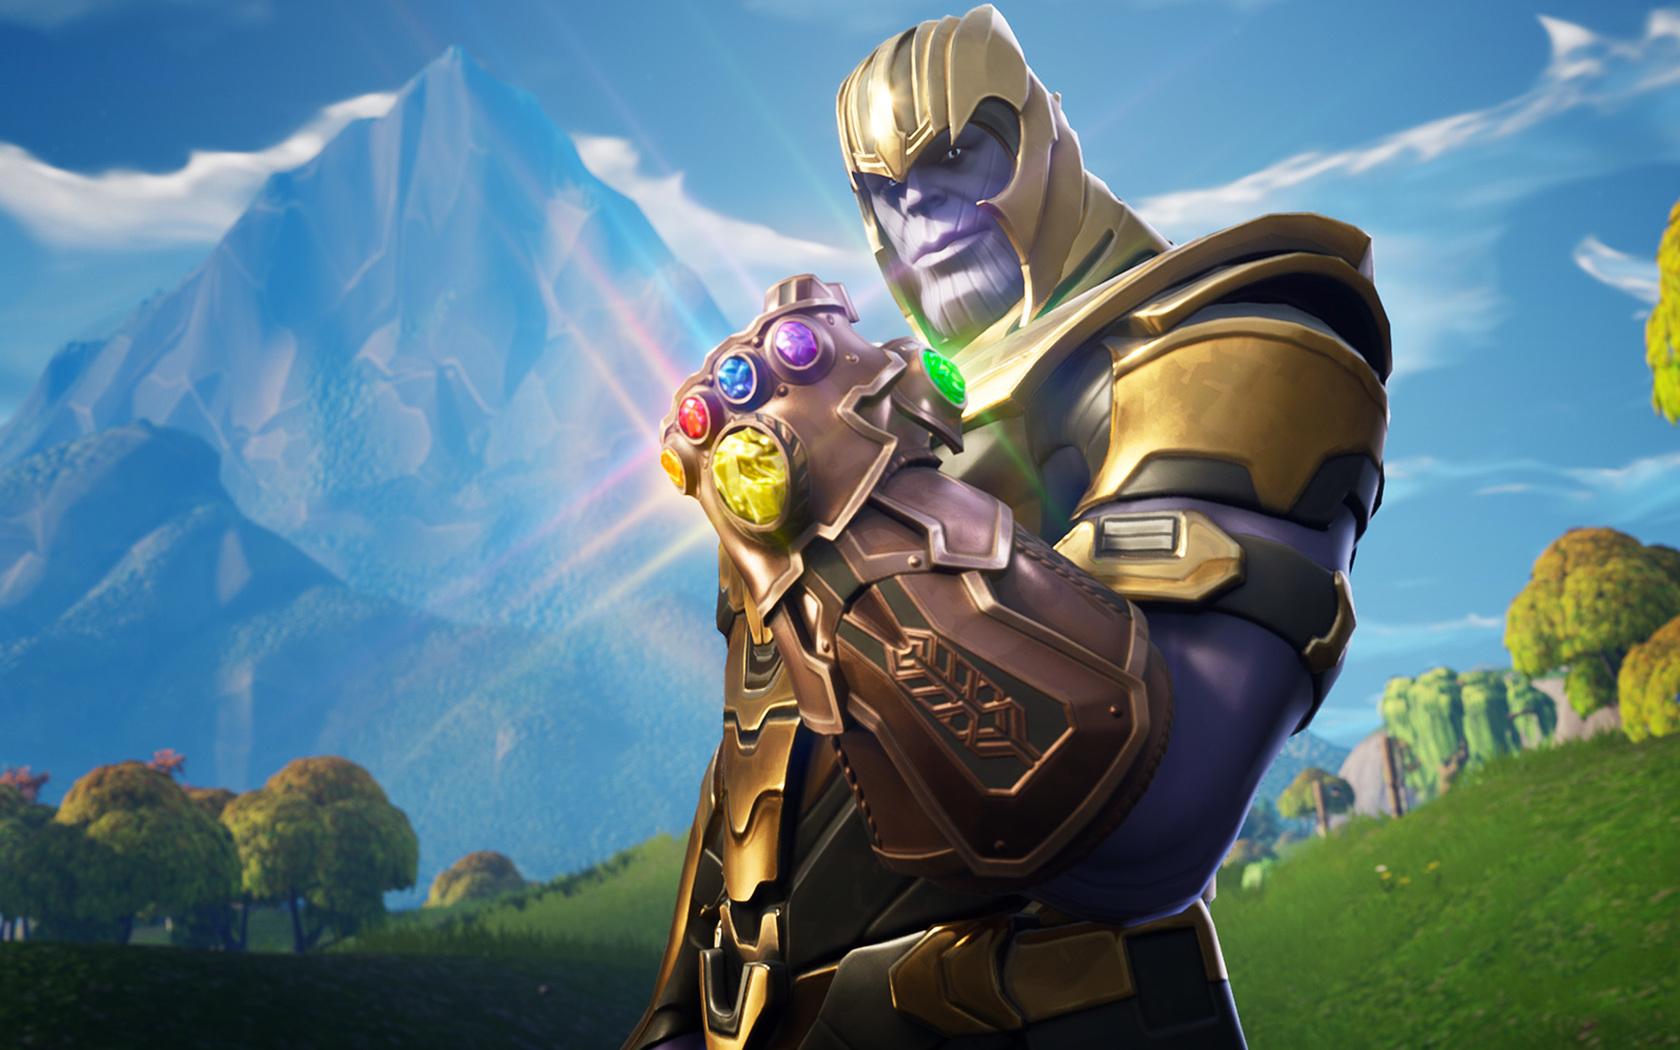 1680x1050 Thanos In Fortnite Battle Royale 1680x1050 Resolution HD 1680x1050